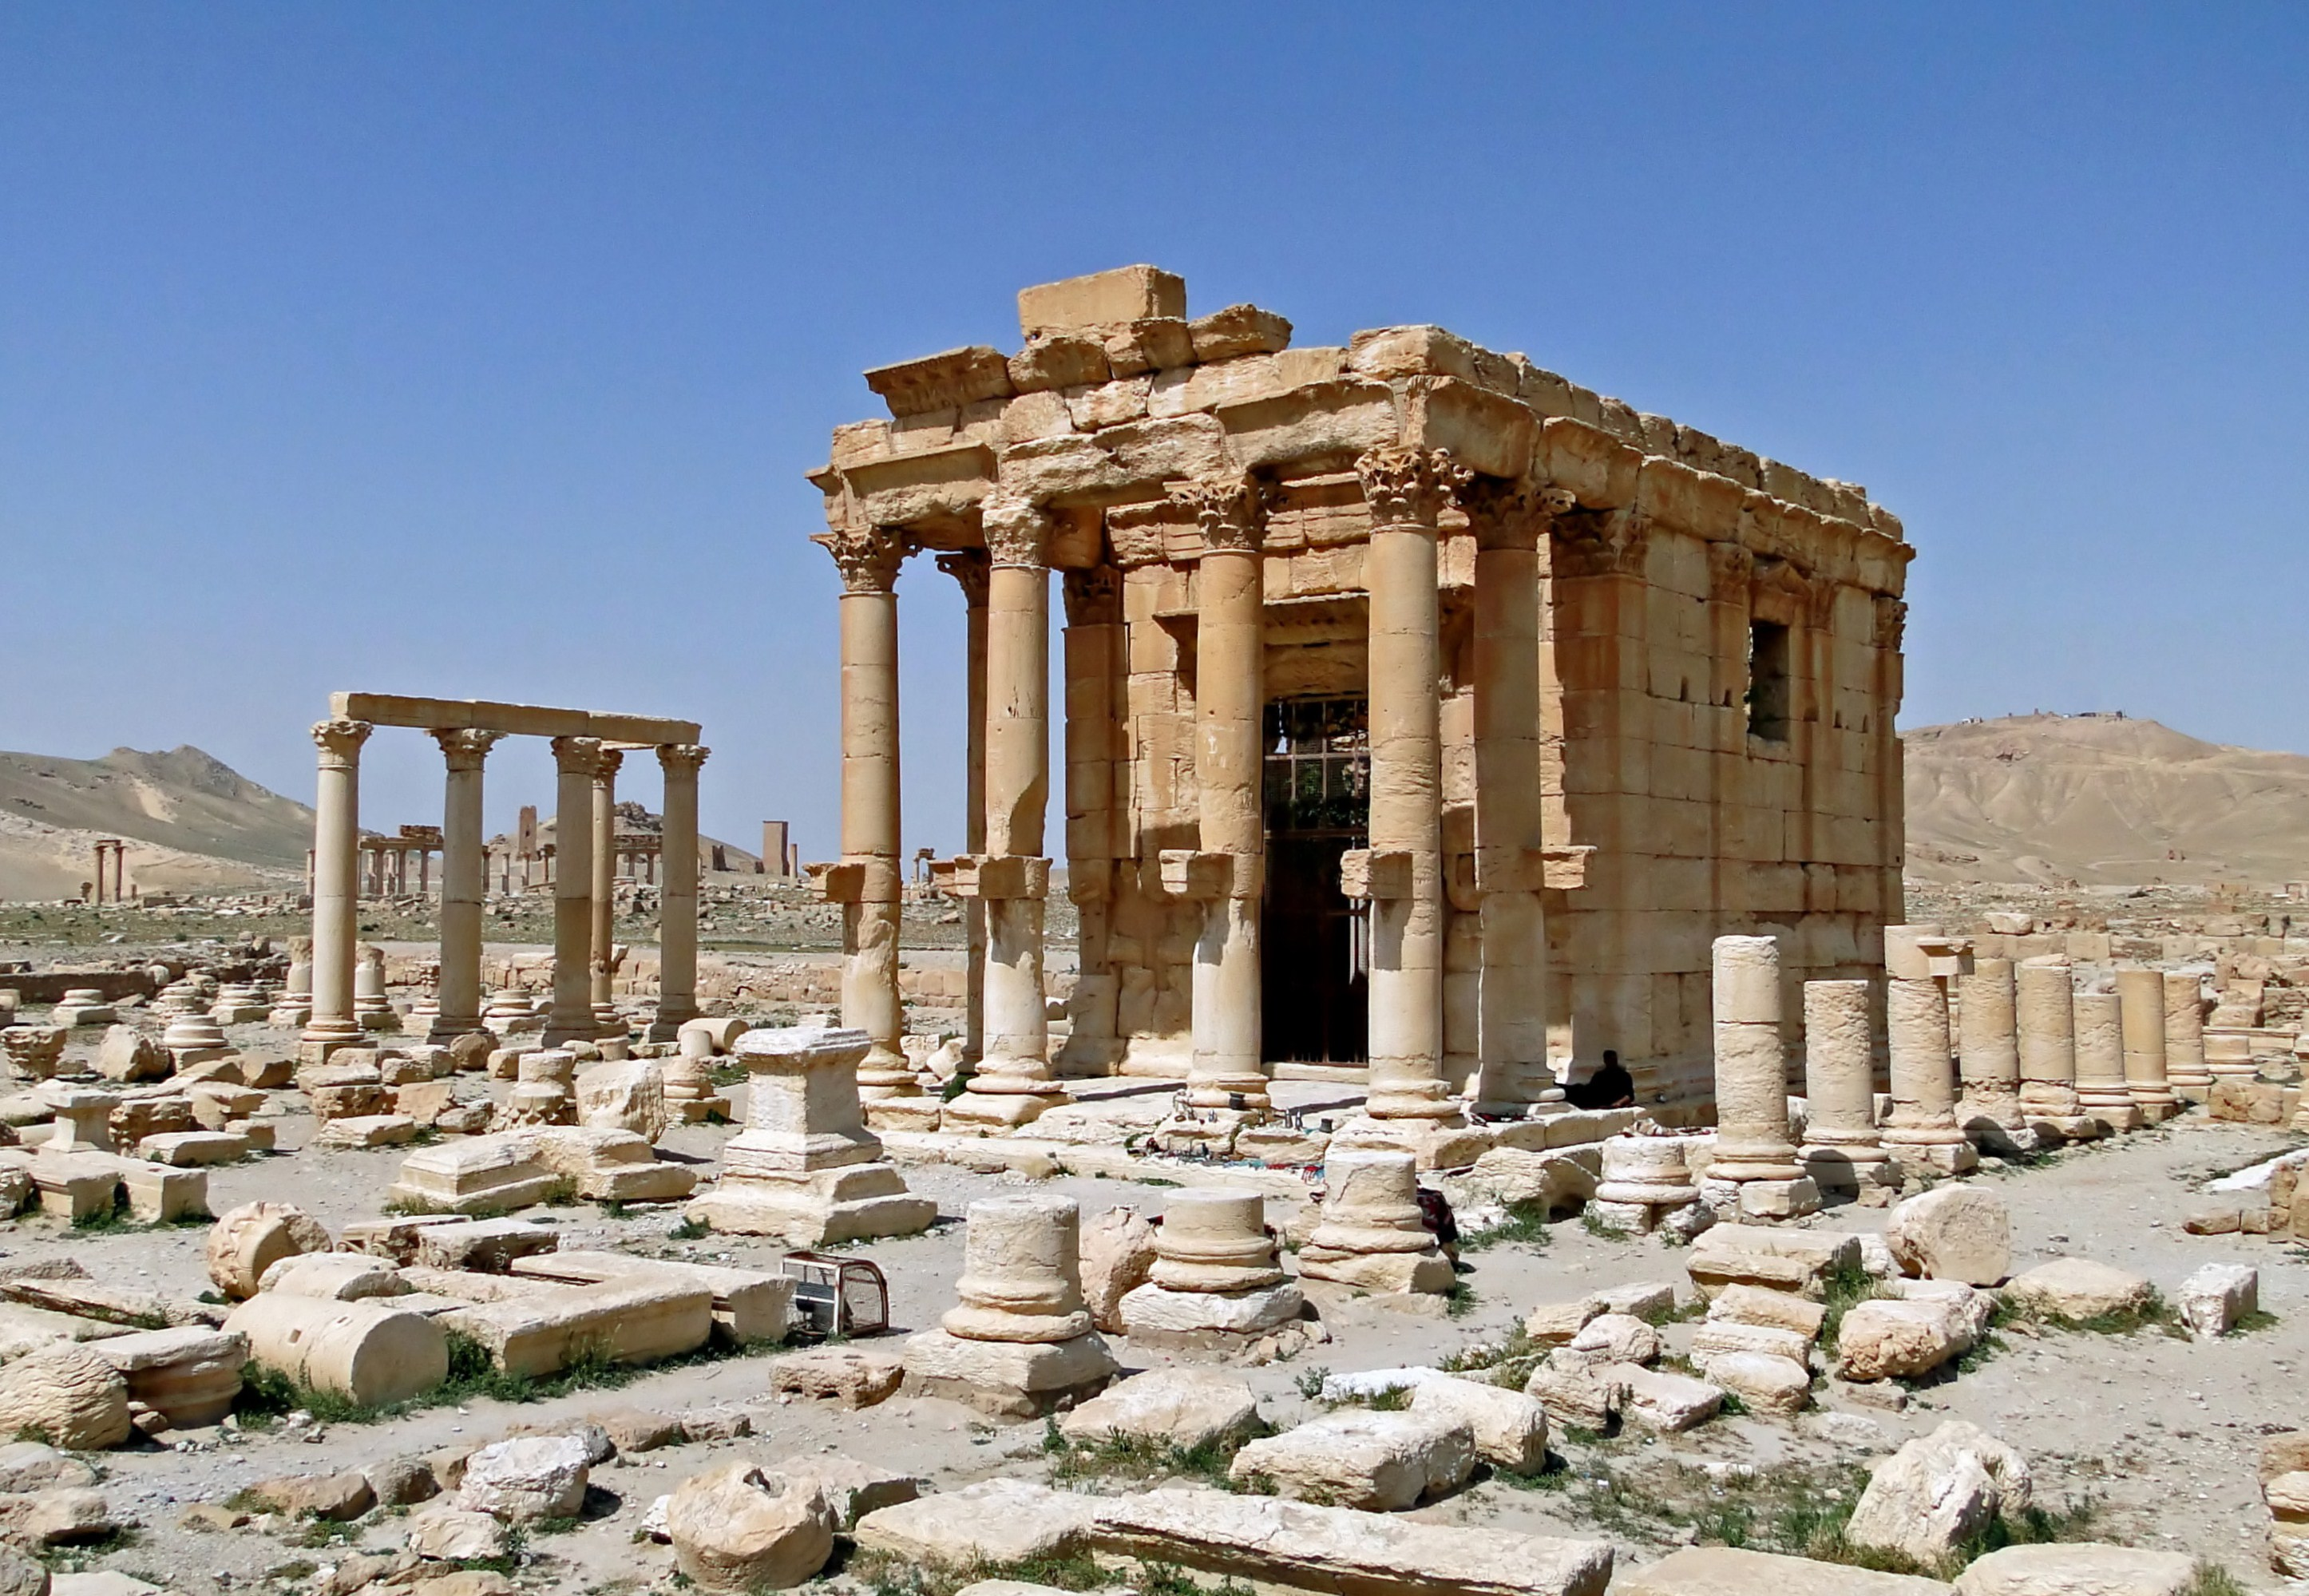 Palmyre - Syrie - Temple Baalshamin - Avant destruction par DAECH - EI - Bergnard Gagnon